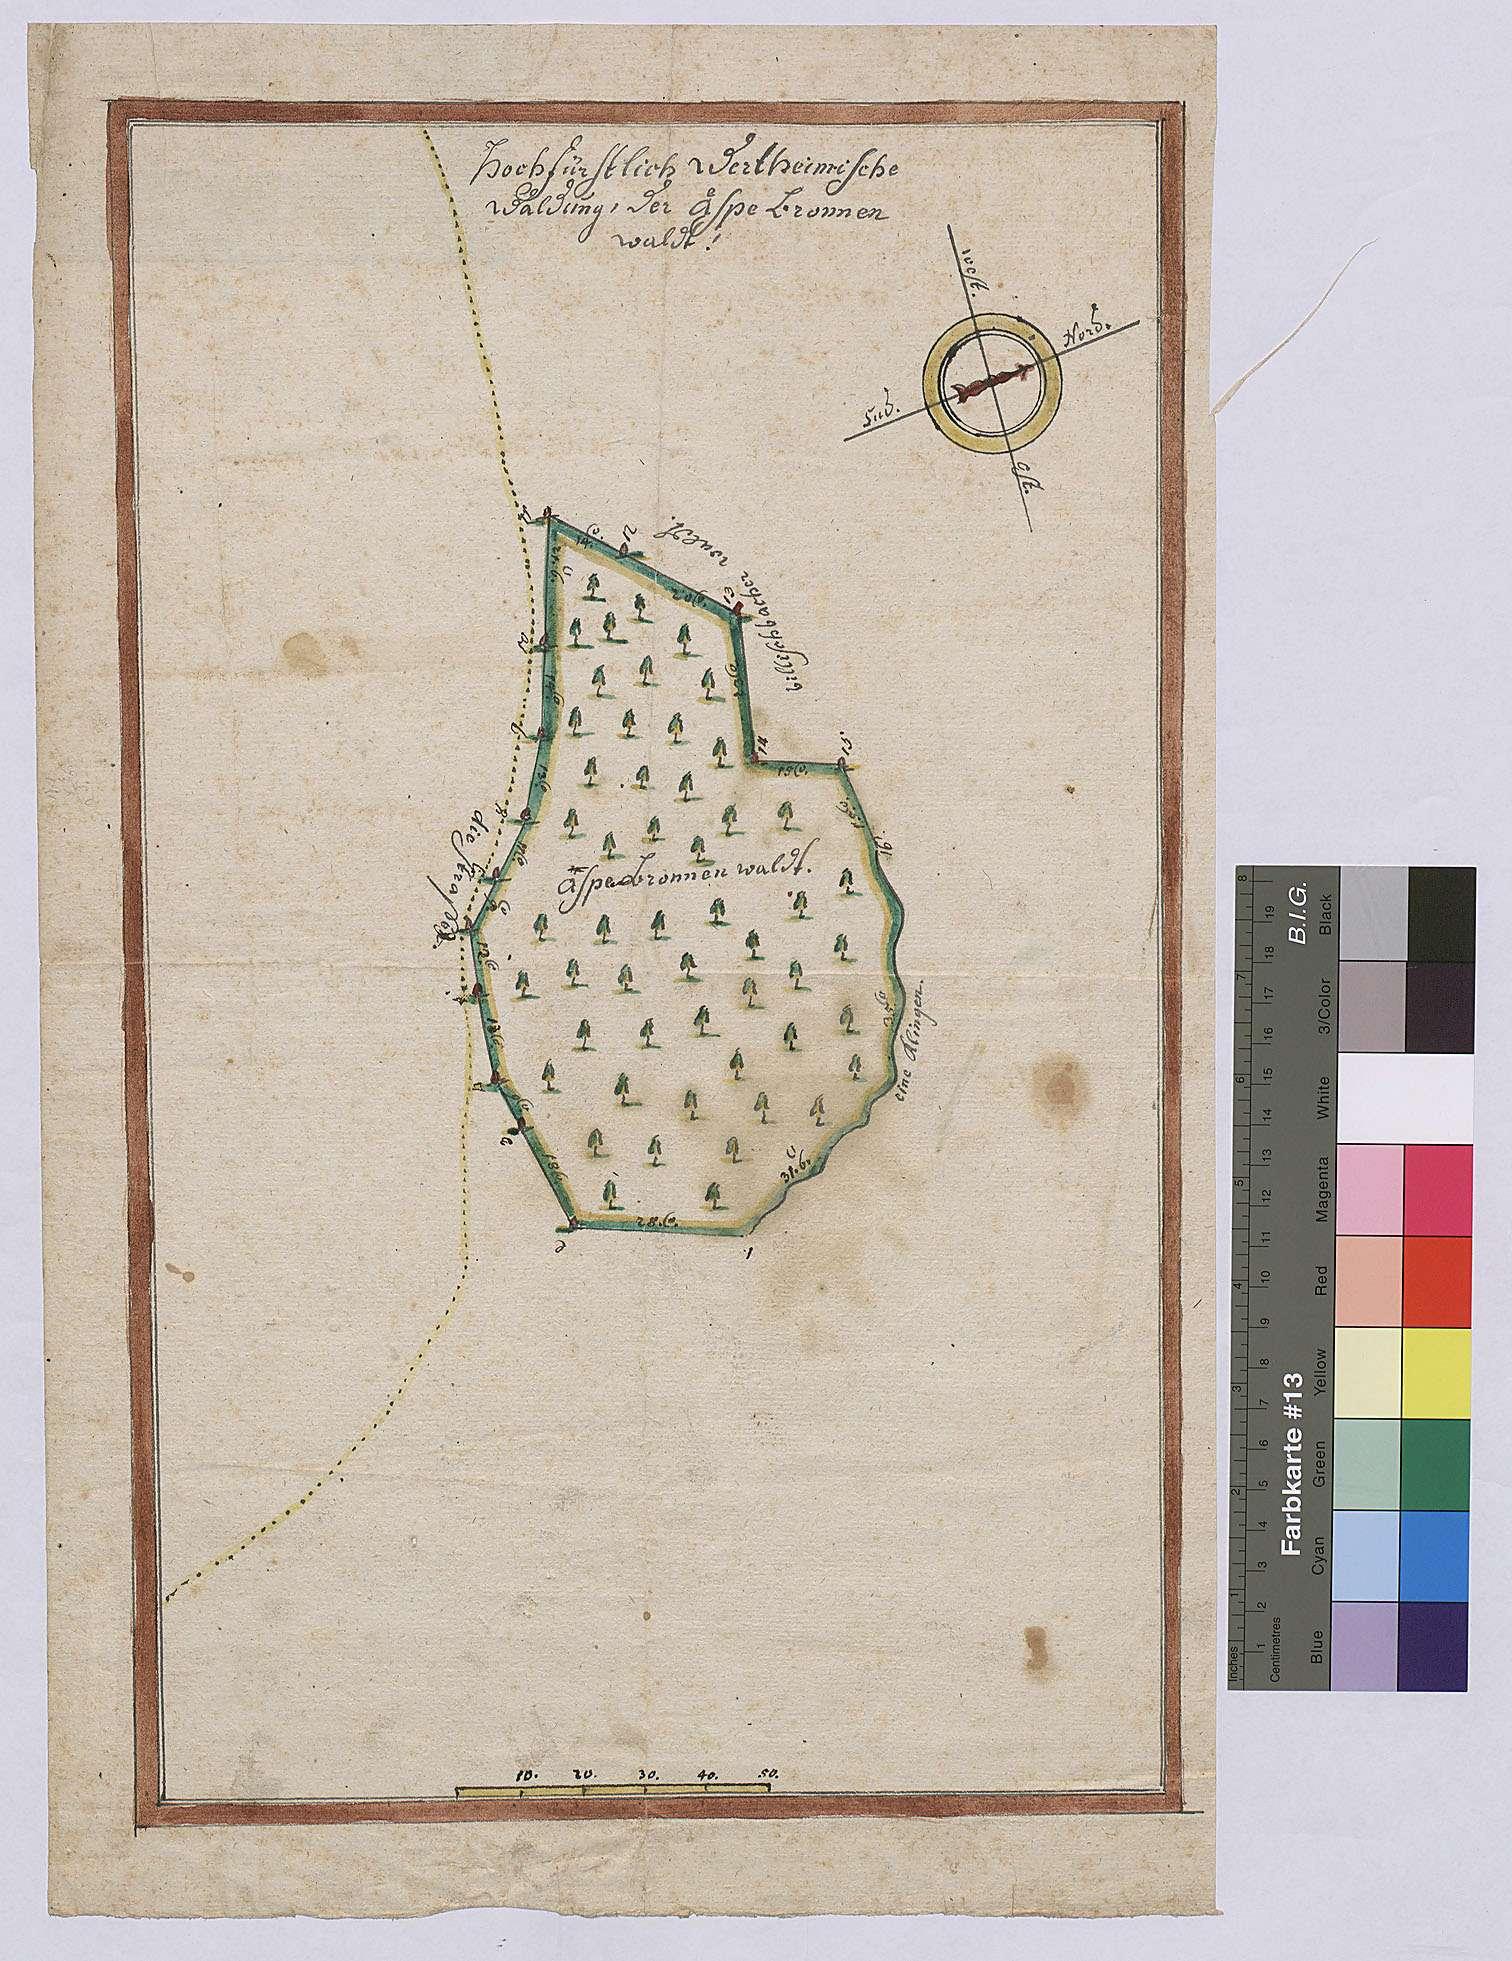 Aspenbrunnenwald (Äspebronnenwaldt) (Inselkarte), Bild 1